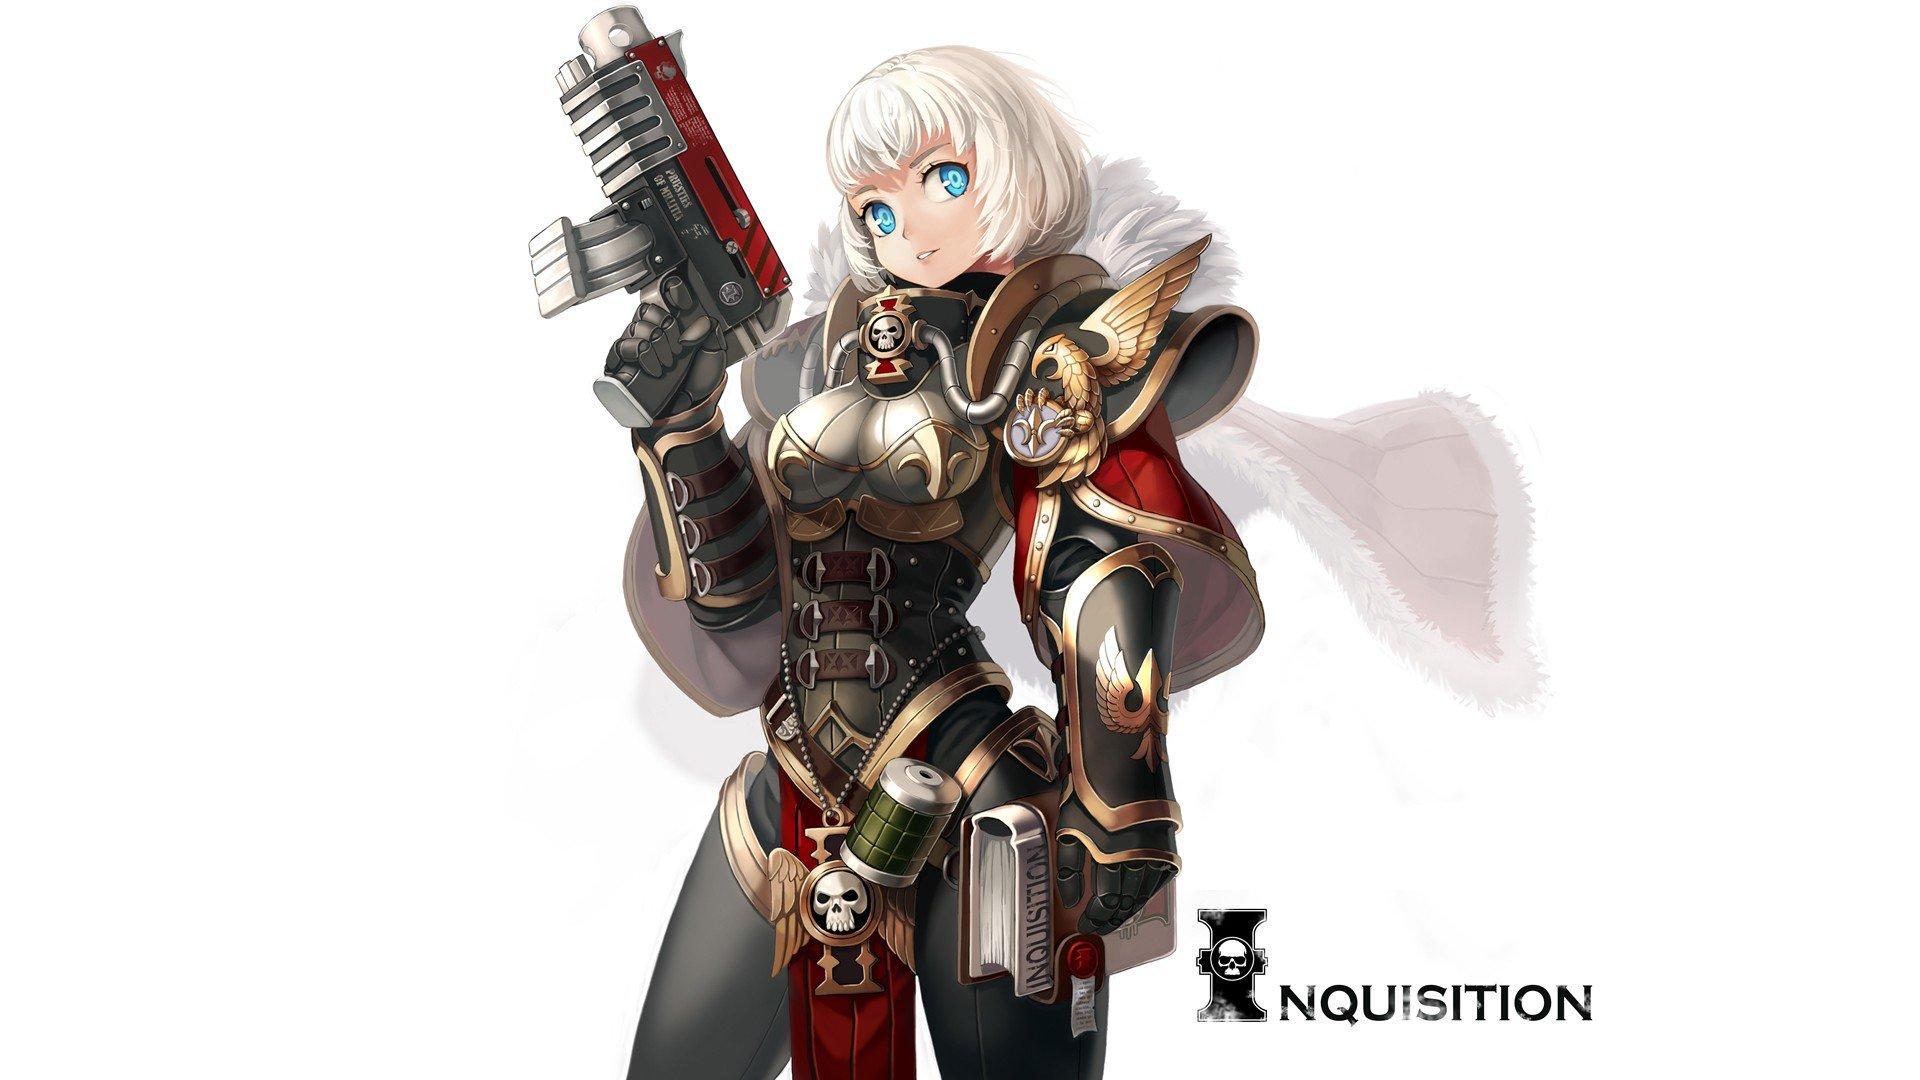 Girl Anime Wallpaper Free Download Weapons Armor Short Hair White Hair Sisters Of Battle